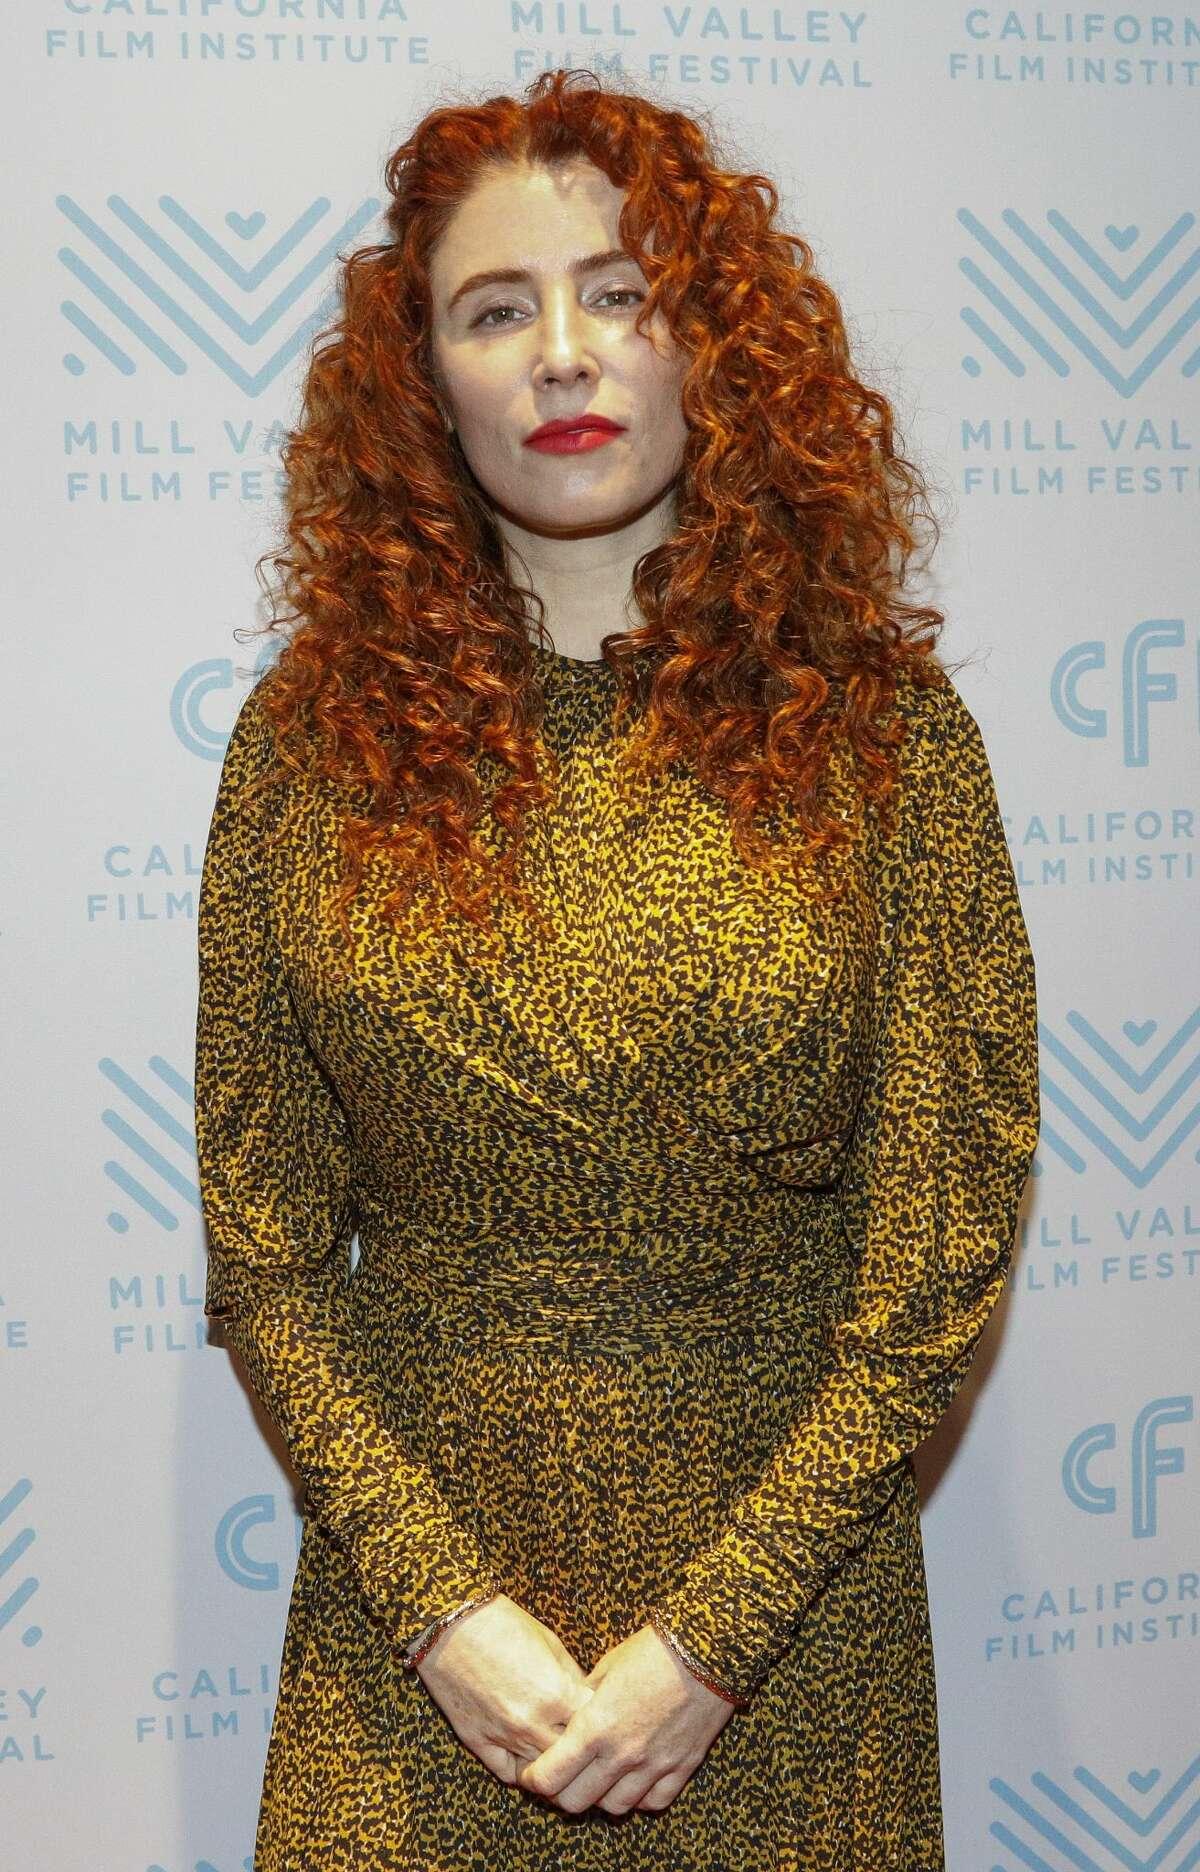 LARKSPUR, CA - OCTOBER 09: Alma Harel attends the 42nd Mill Valley Film Festival -